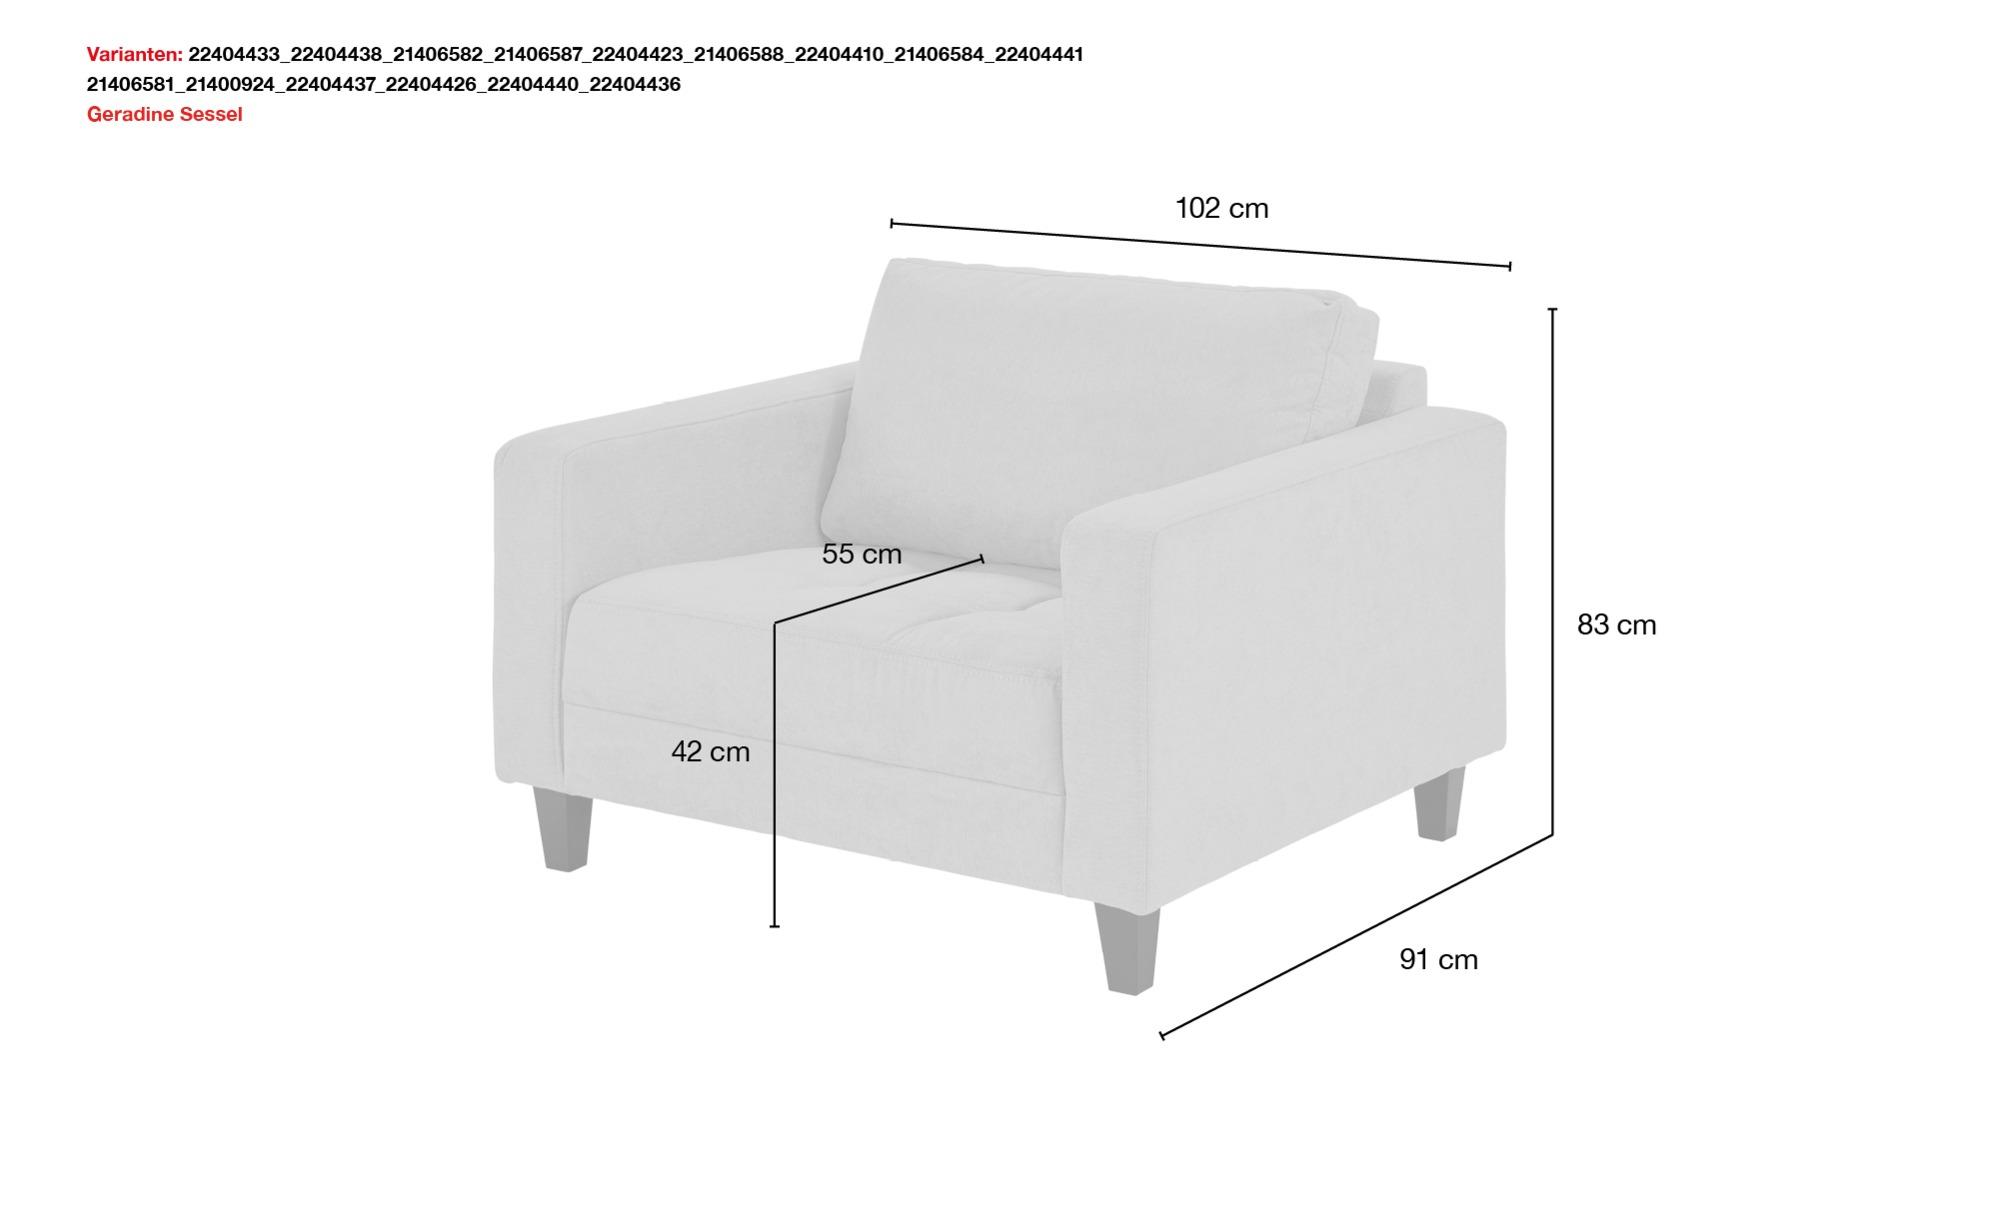 smart Sessel grün - Stoff Geradine ¦ grün ¦ Maße (cm): B: 102 H: 83 T: 91 Polstermöbel > Sessel > Polstersessel - Höffner